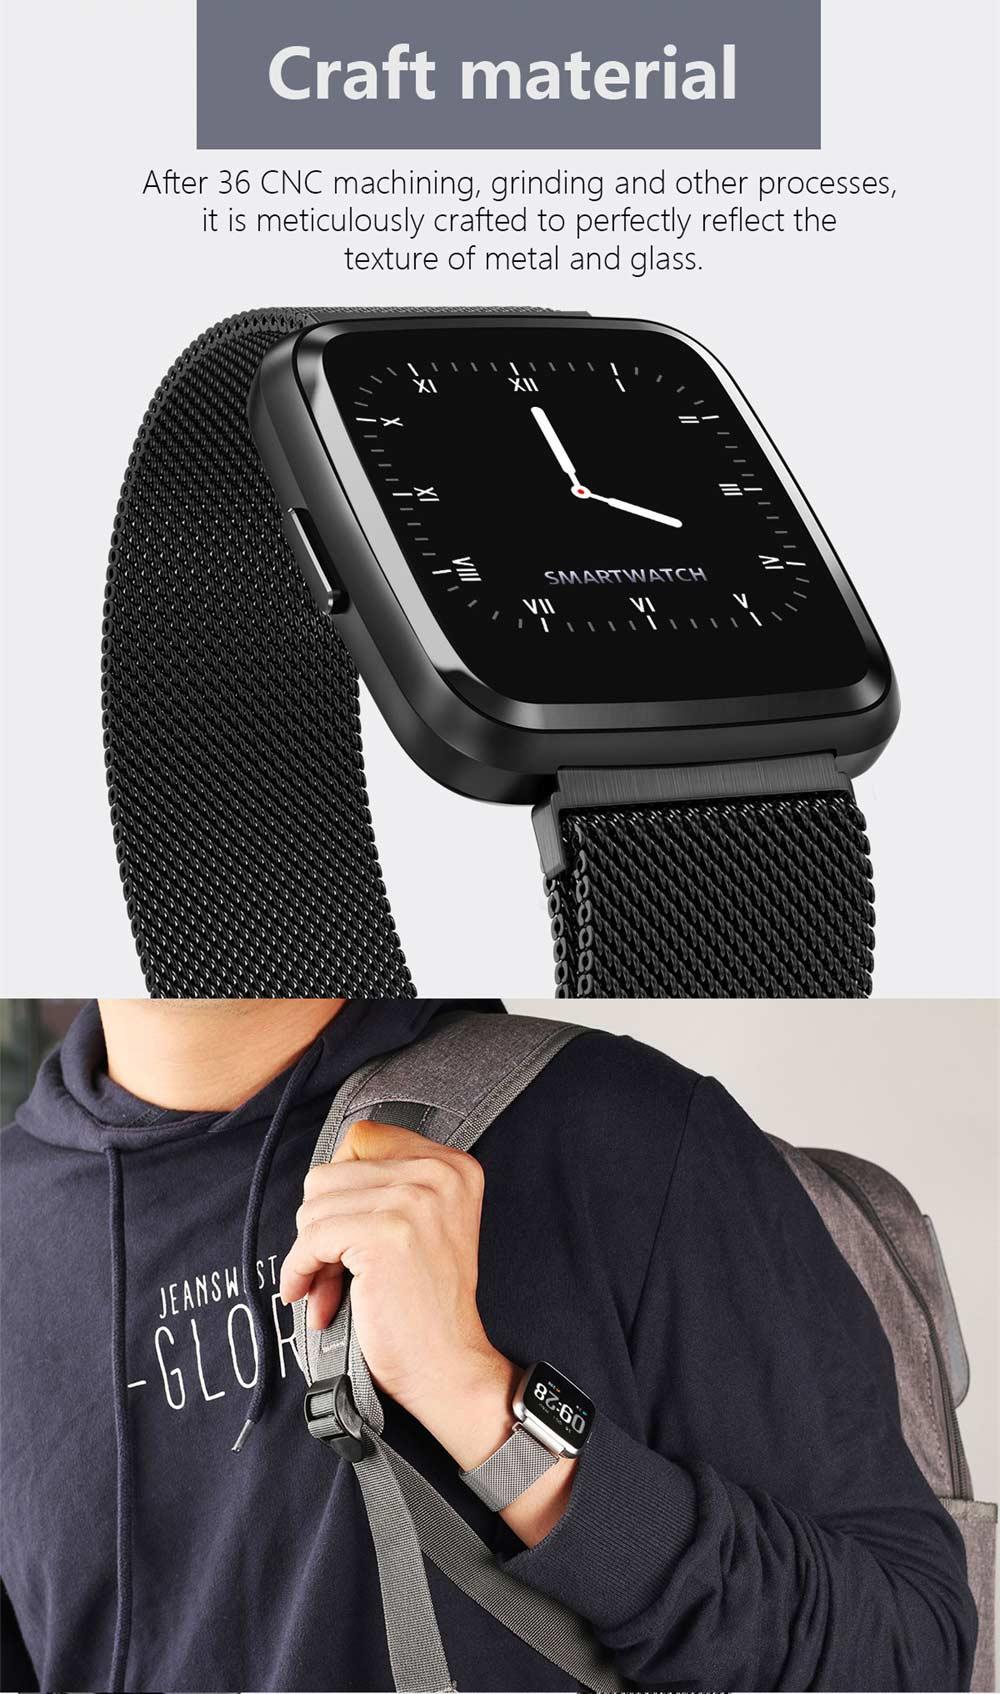 new goral y7 bluetooth smartwatch